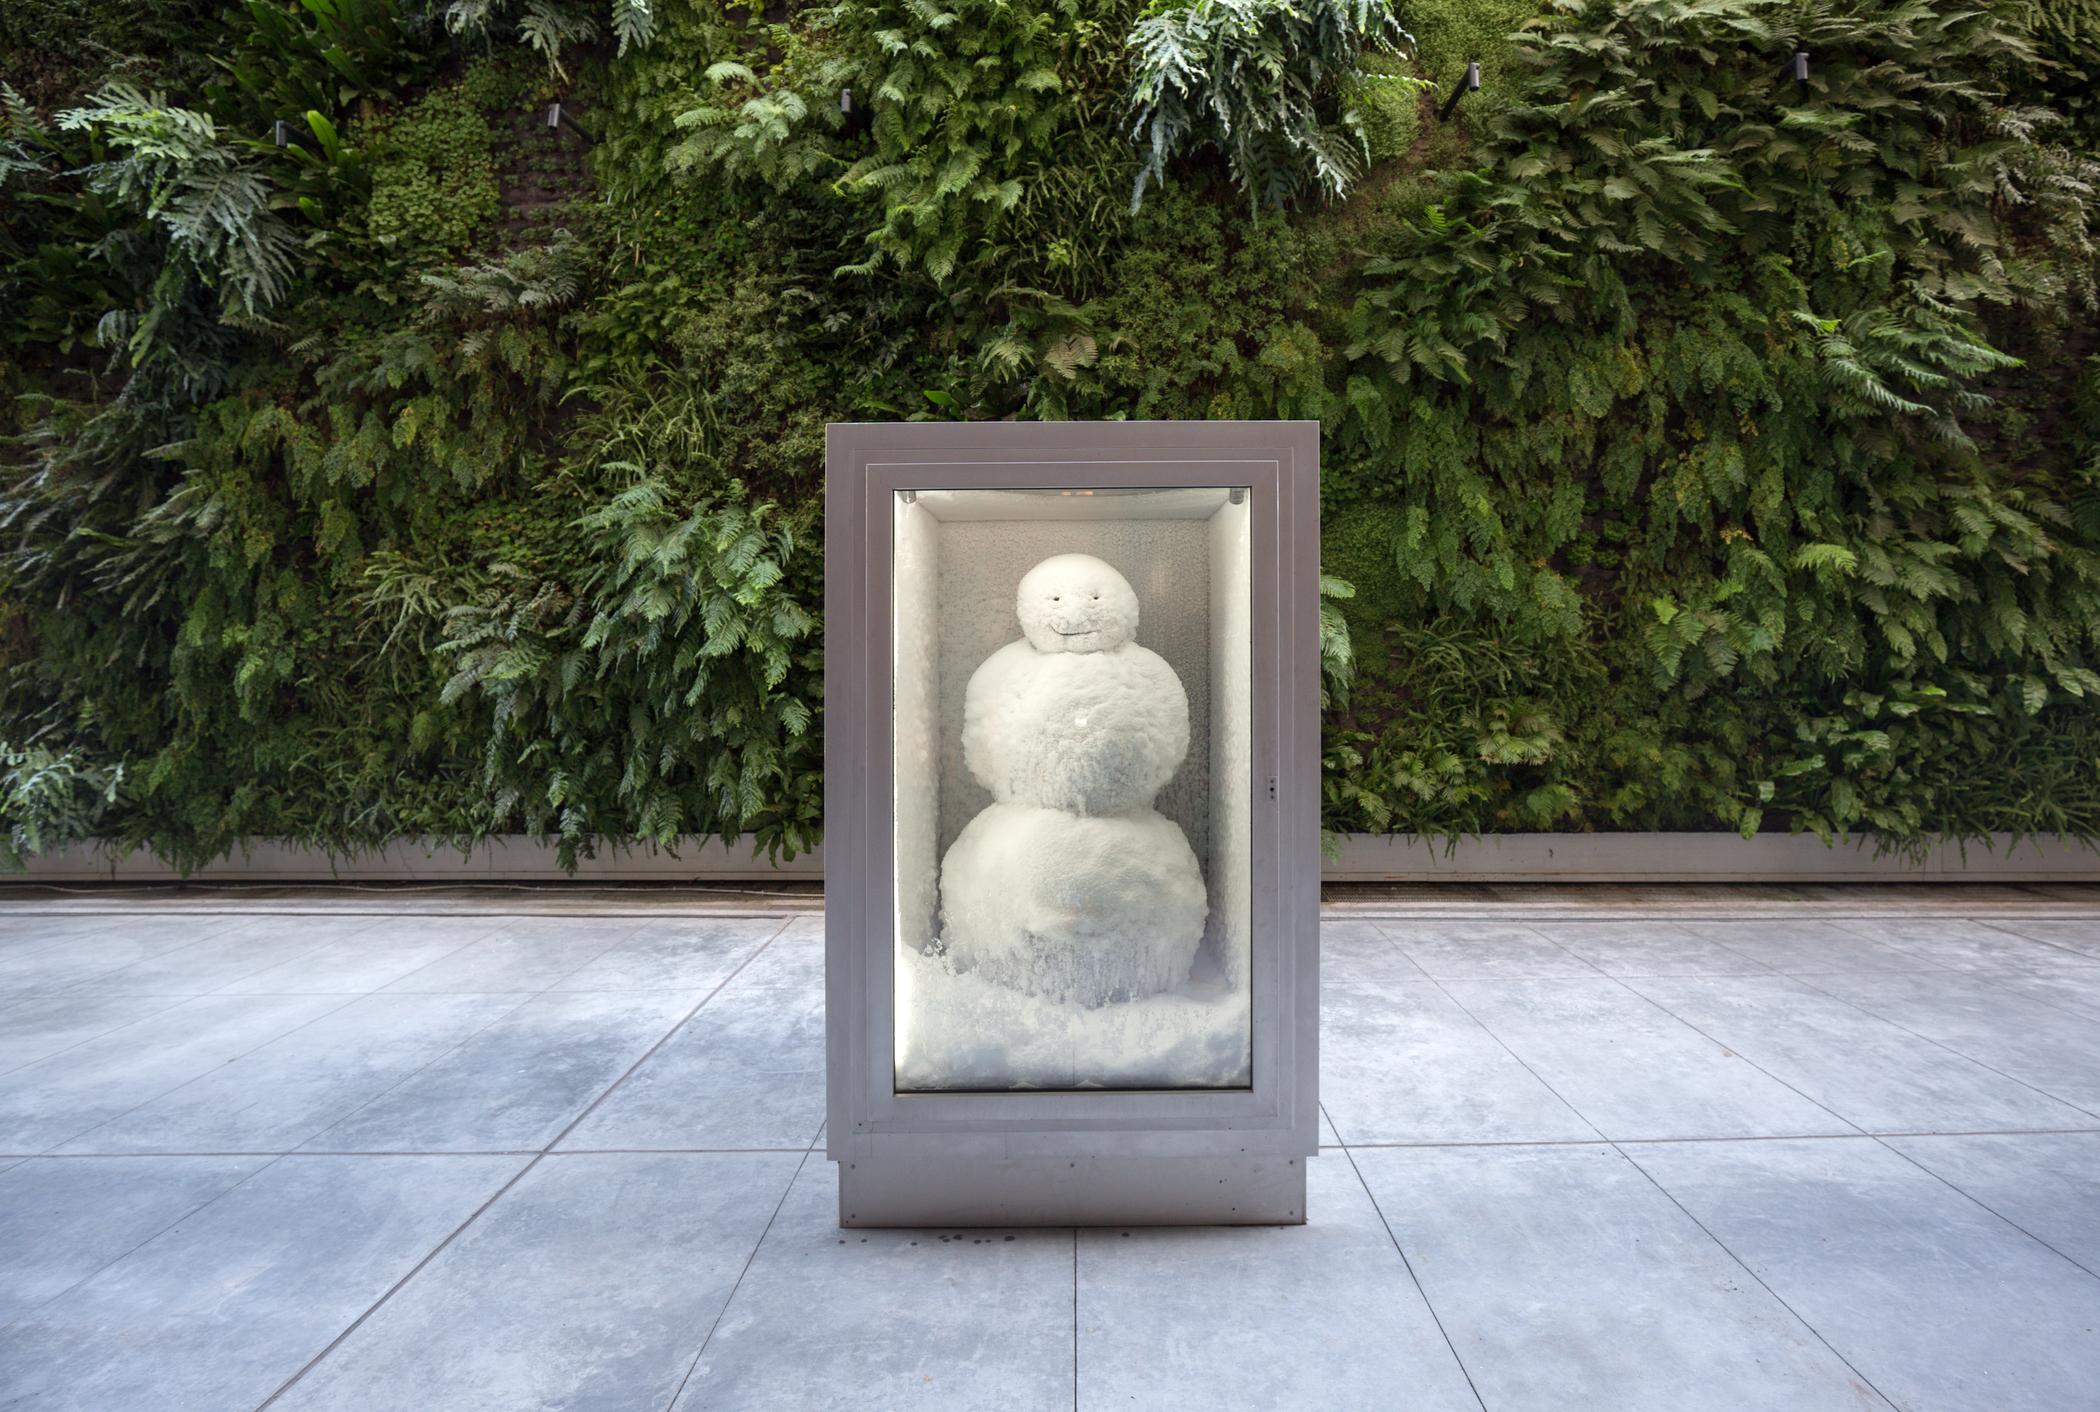 02_Snowman.jpg